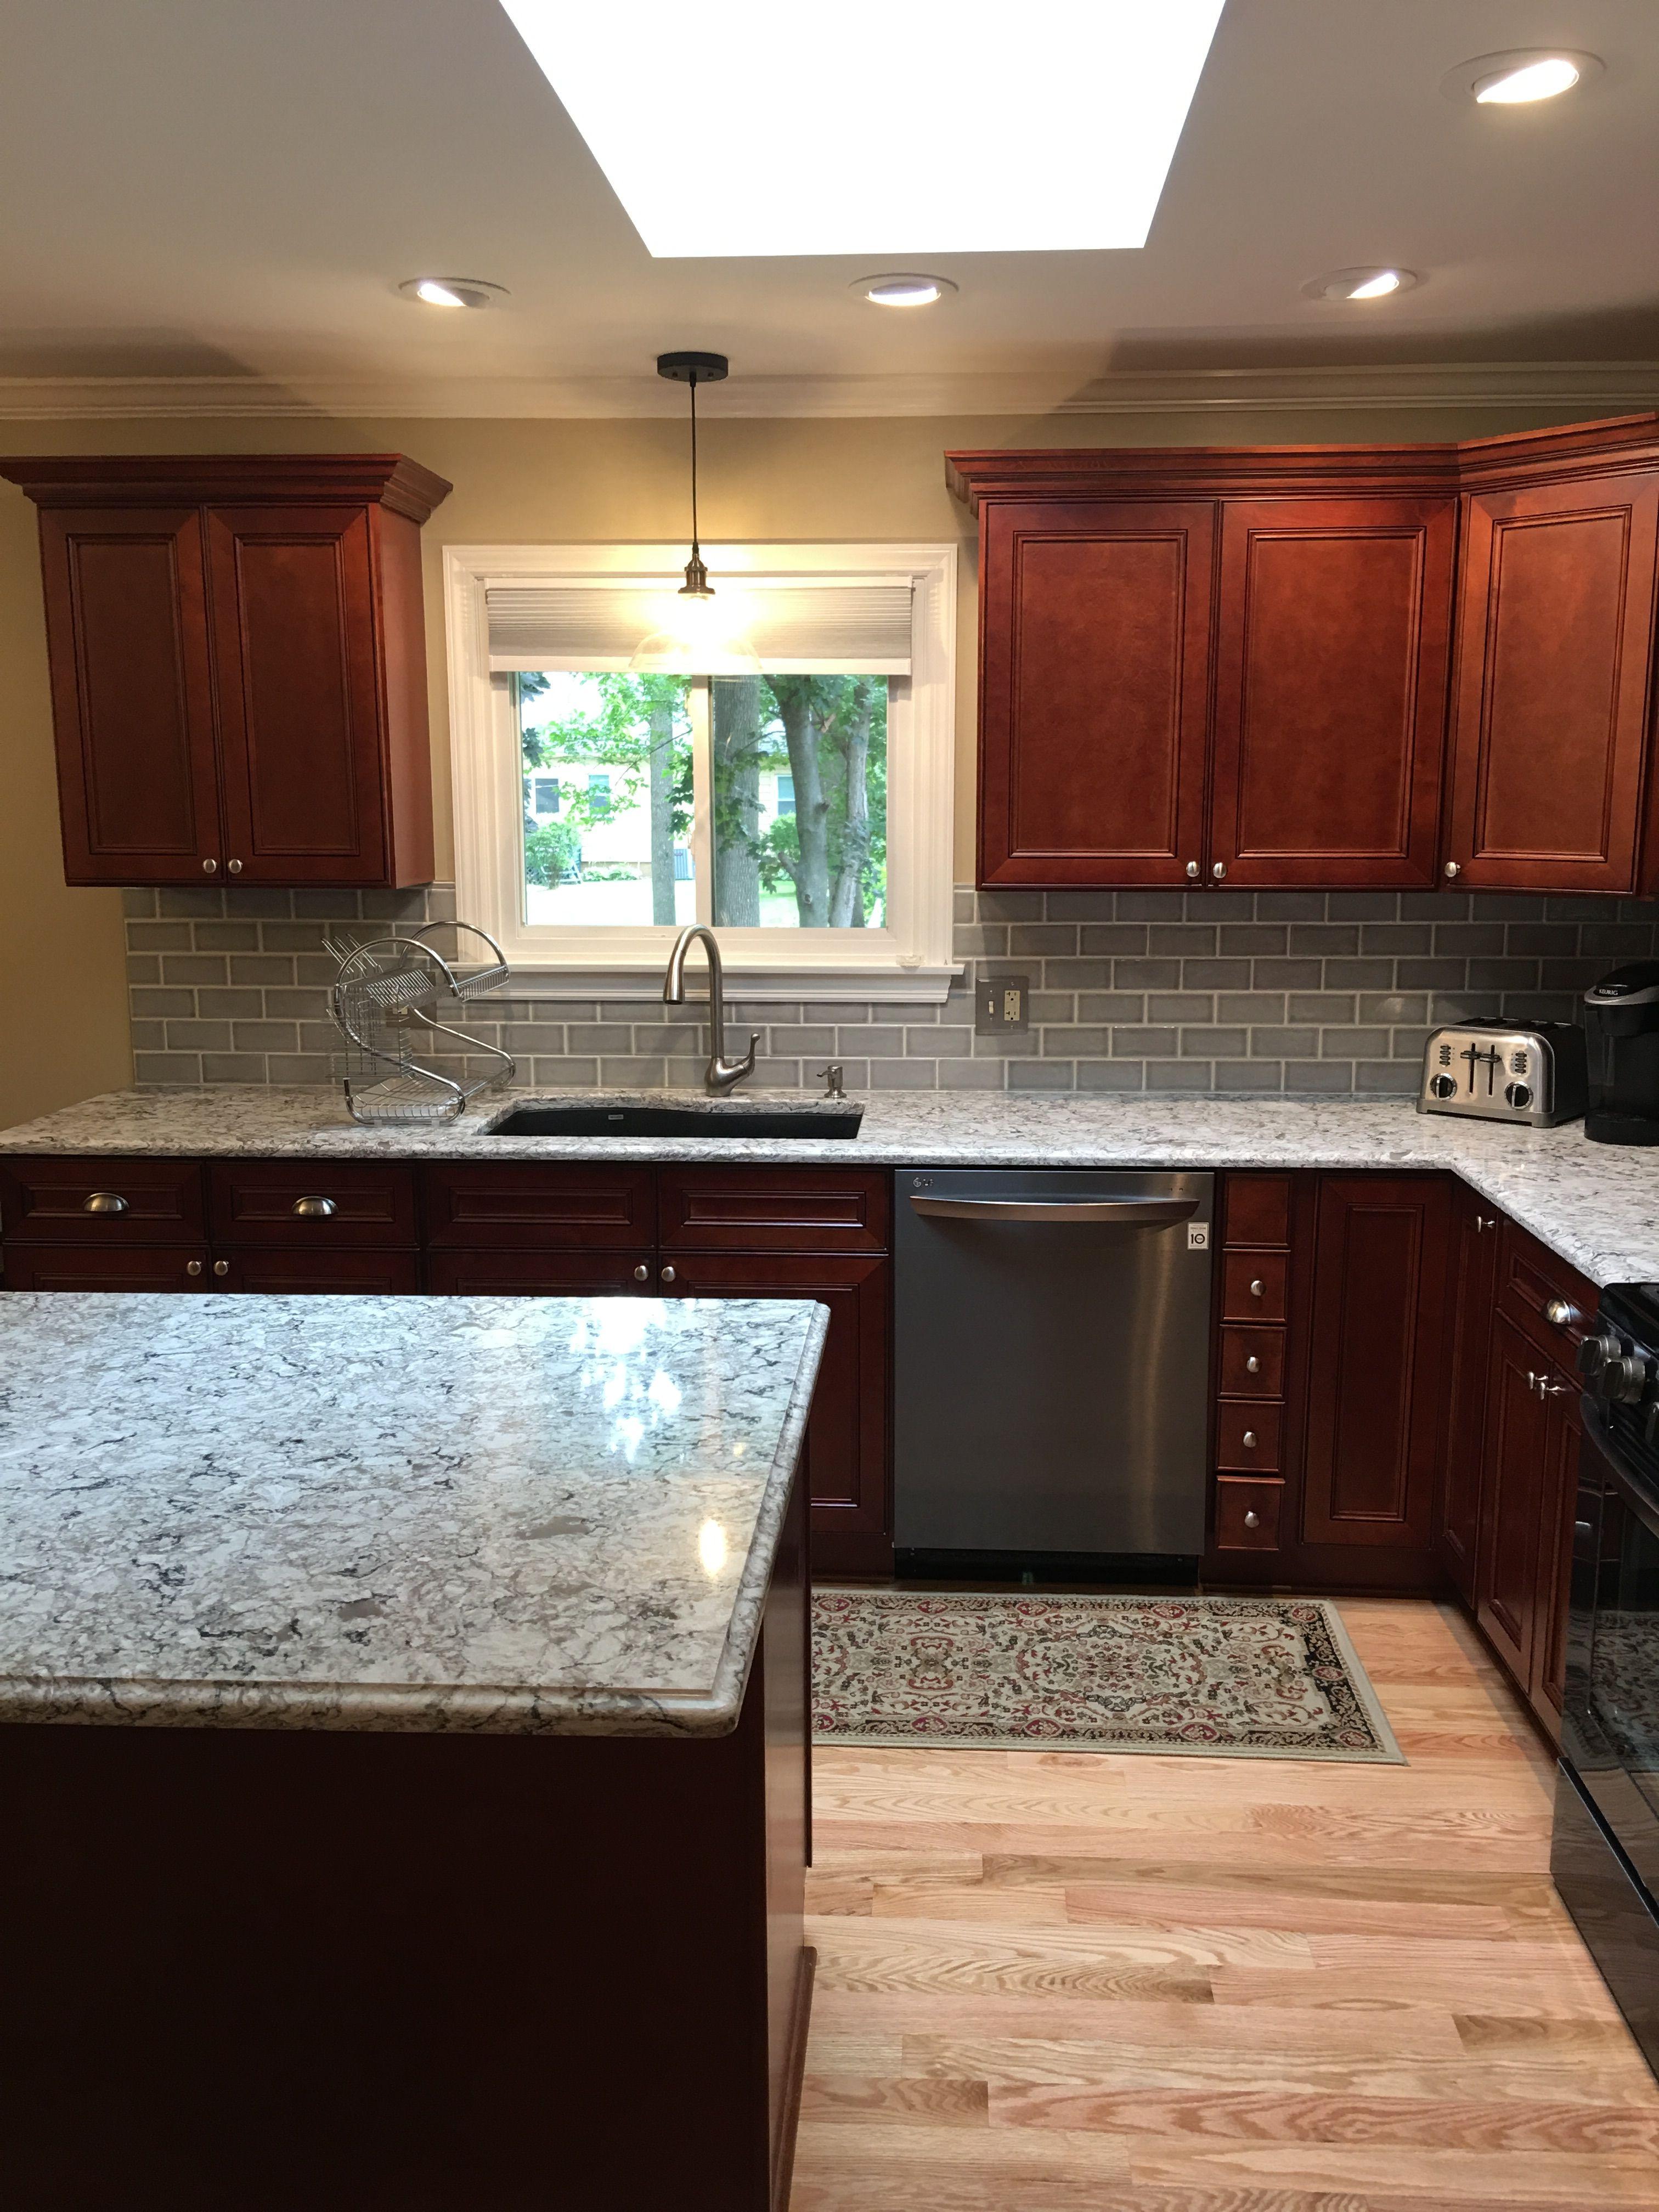 Kitchen Renovation Project In 2020 Kitchen Plans Kitchen Renovation Kitchen Remodel